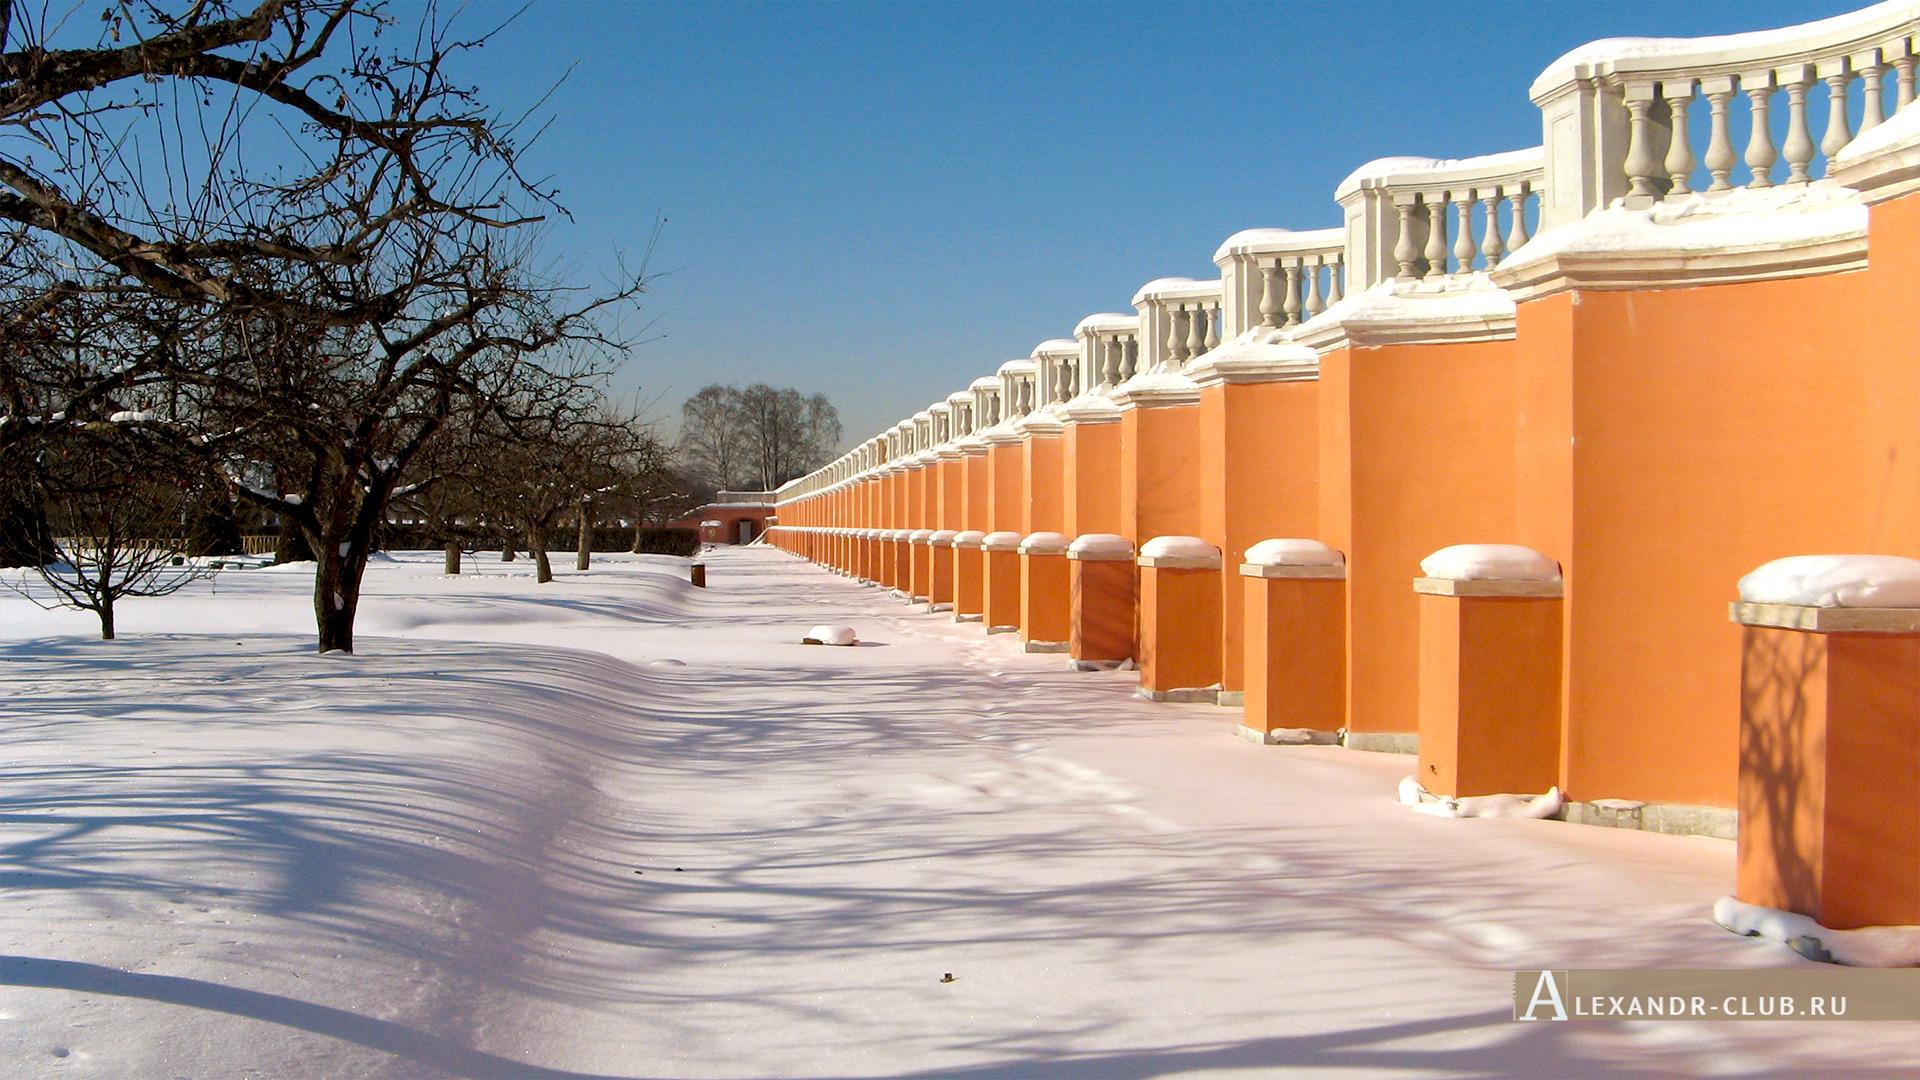 Петергоф, зима, Нижний парк, Марлинский вал – 1